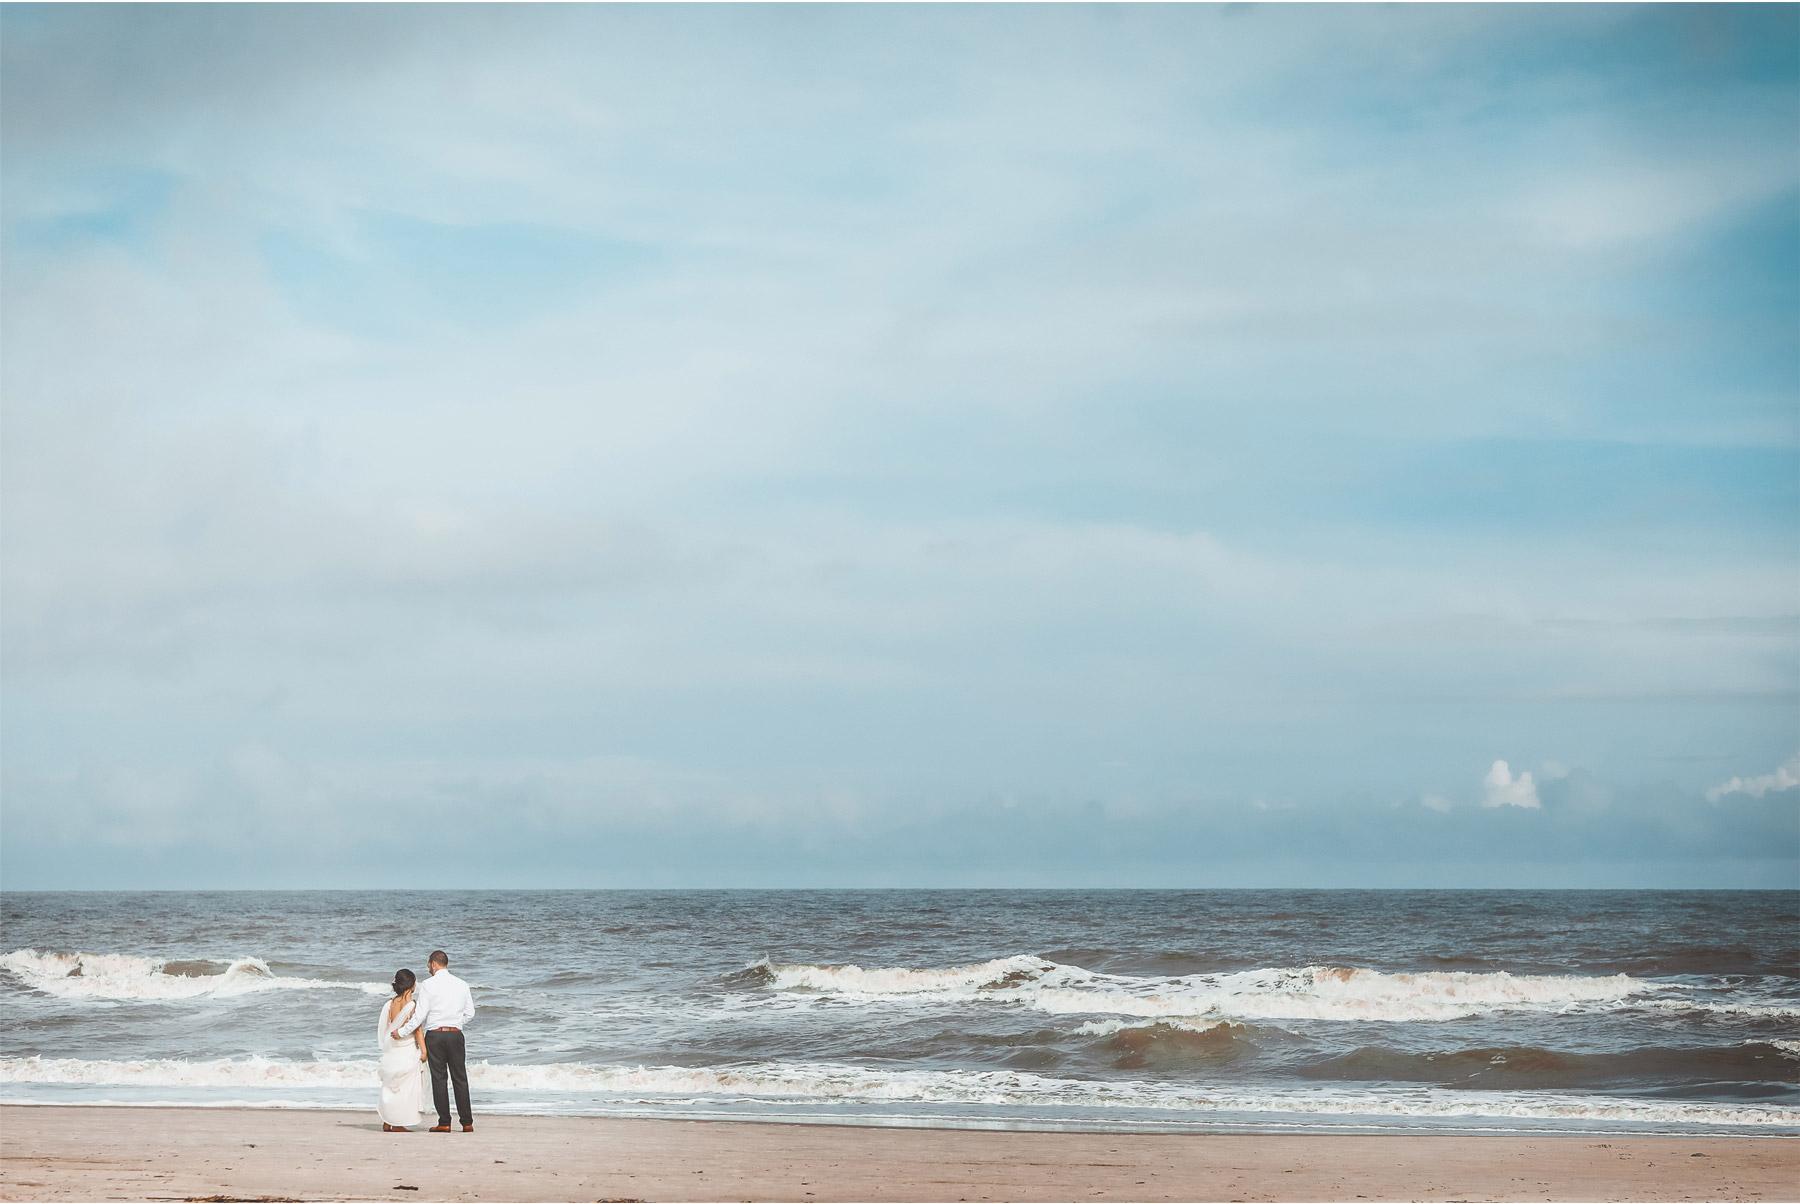 21-South-Carolina-Wedding-by-Vick-Photography-Hilton-Head-Island-Omni-Oceanfront-Hotel-Destination-Beach-Ocean-Bride-Groom-Sand-Felyn-and-Will.jpg